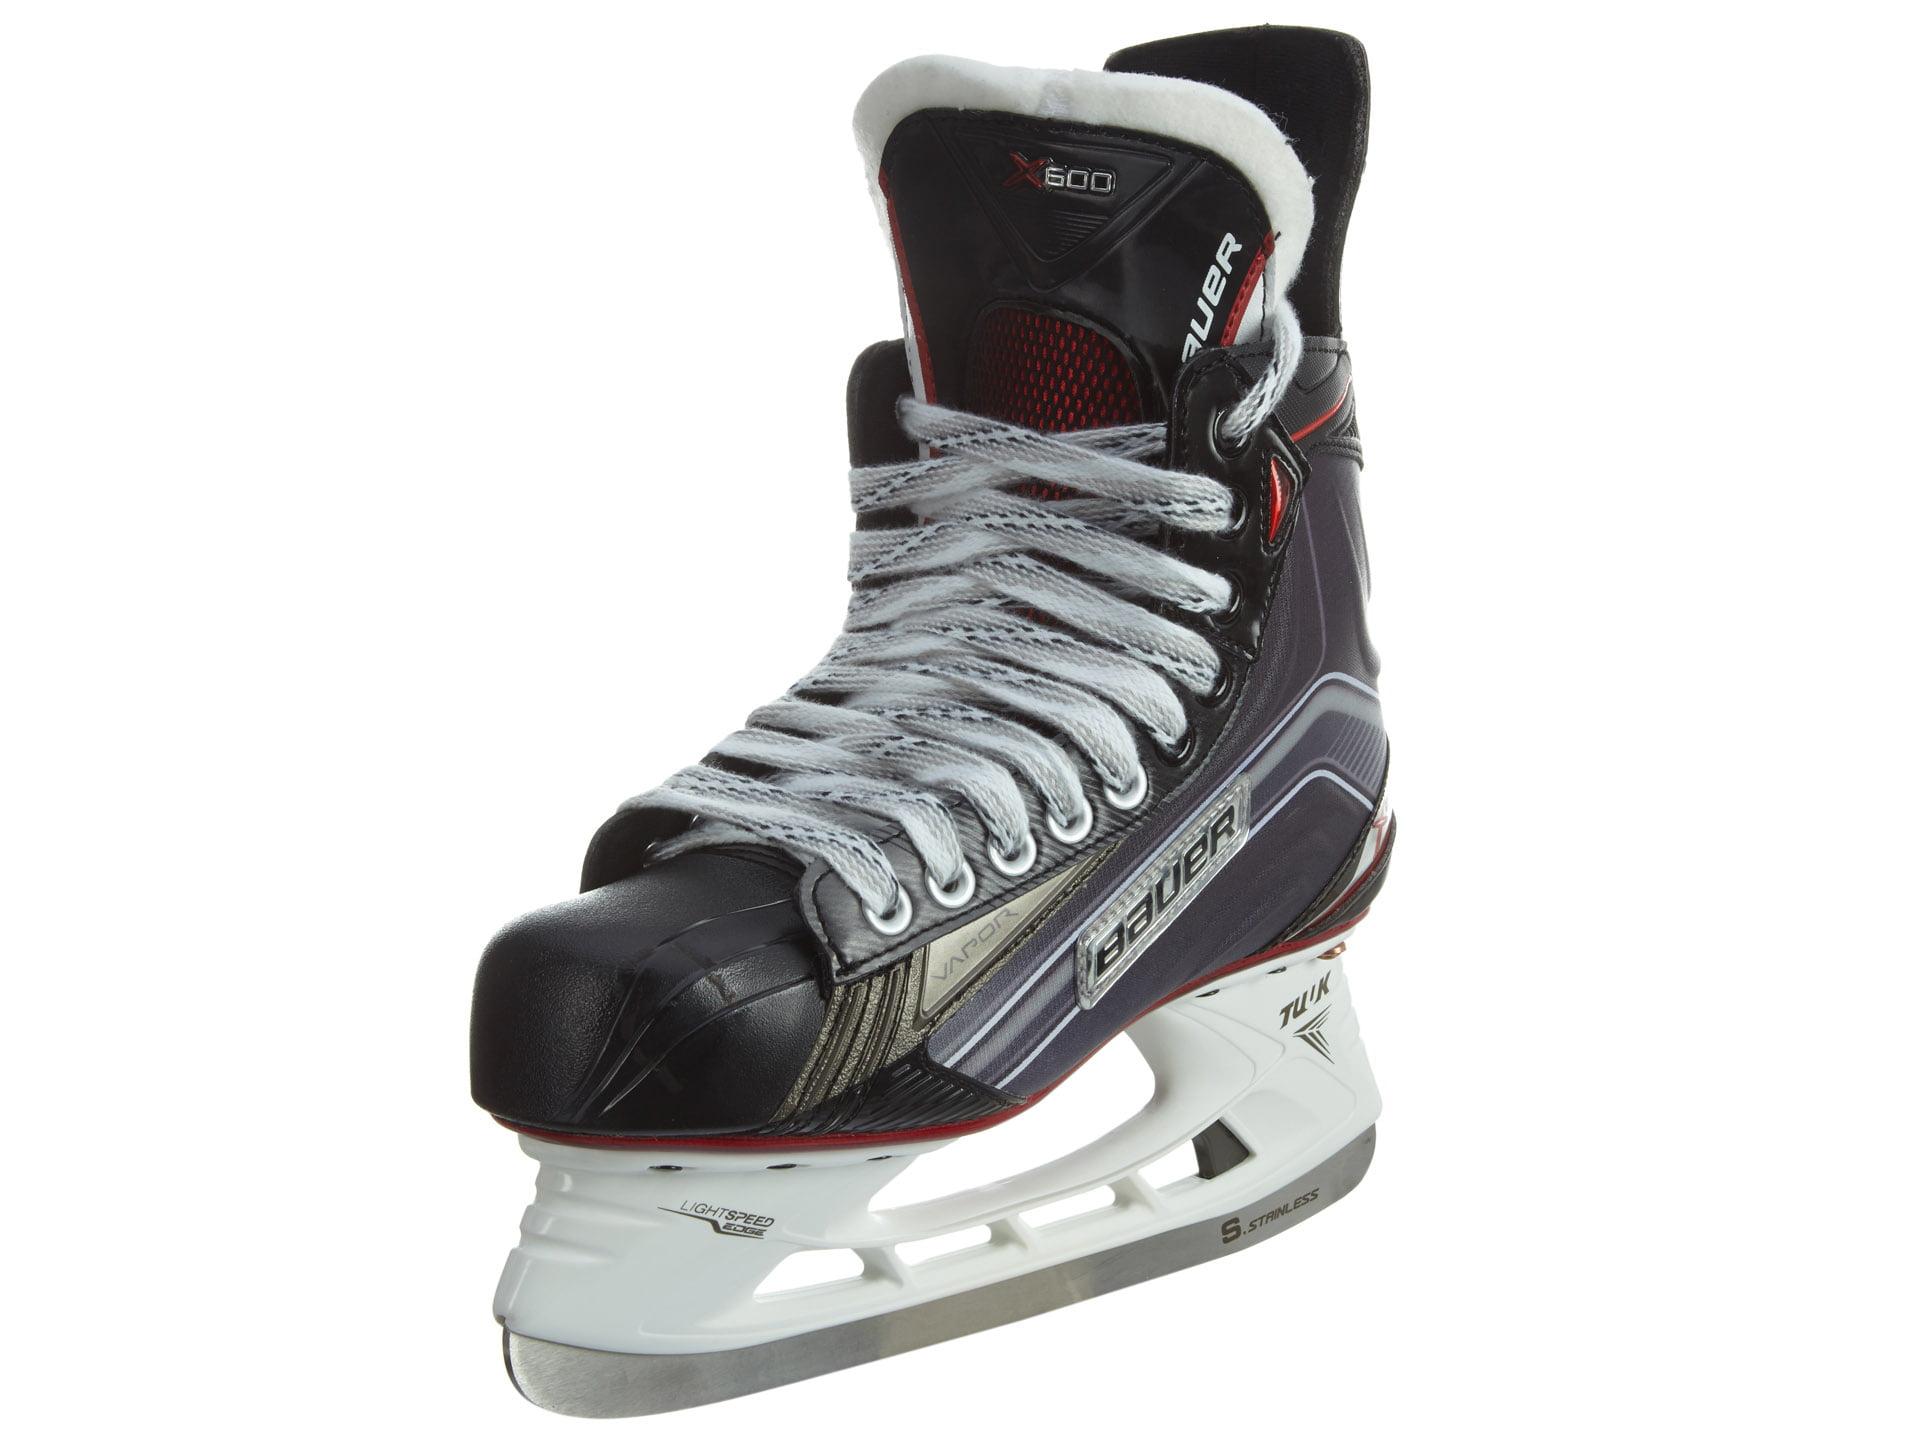 Bauer X600 Dynamic Speed Hockey Skates Unisex Style : 1045929 by